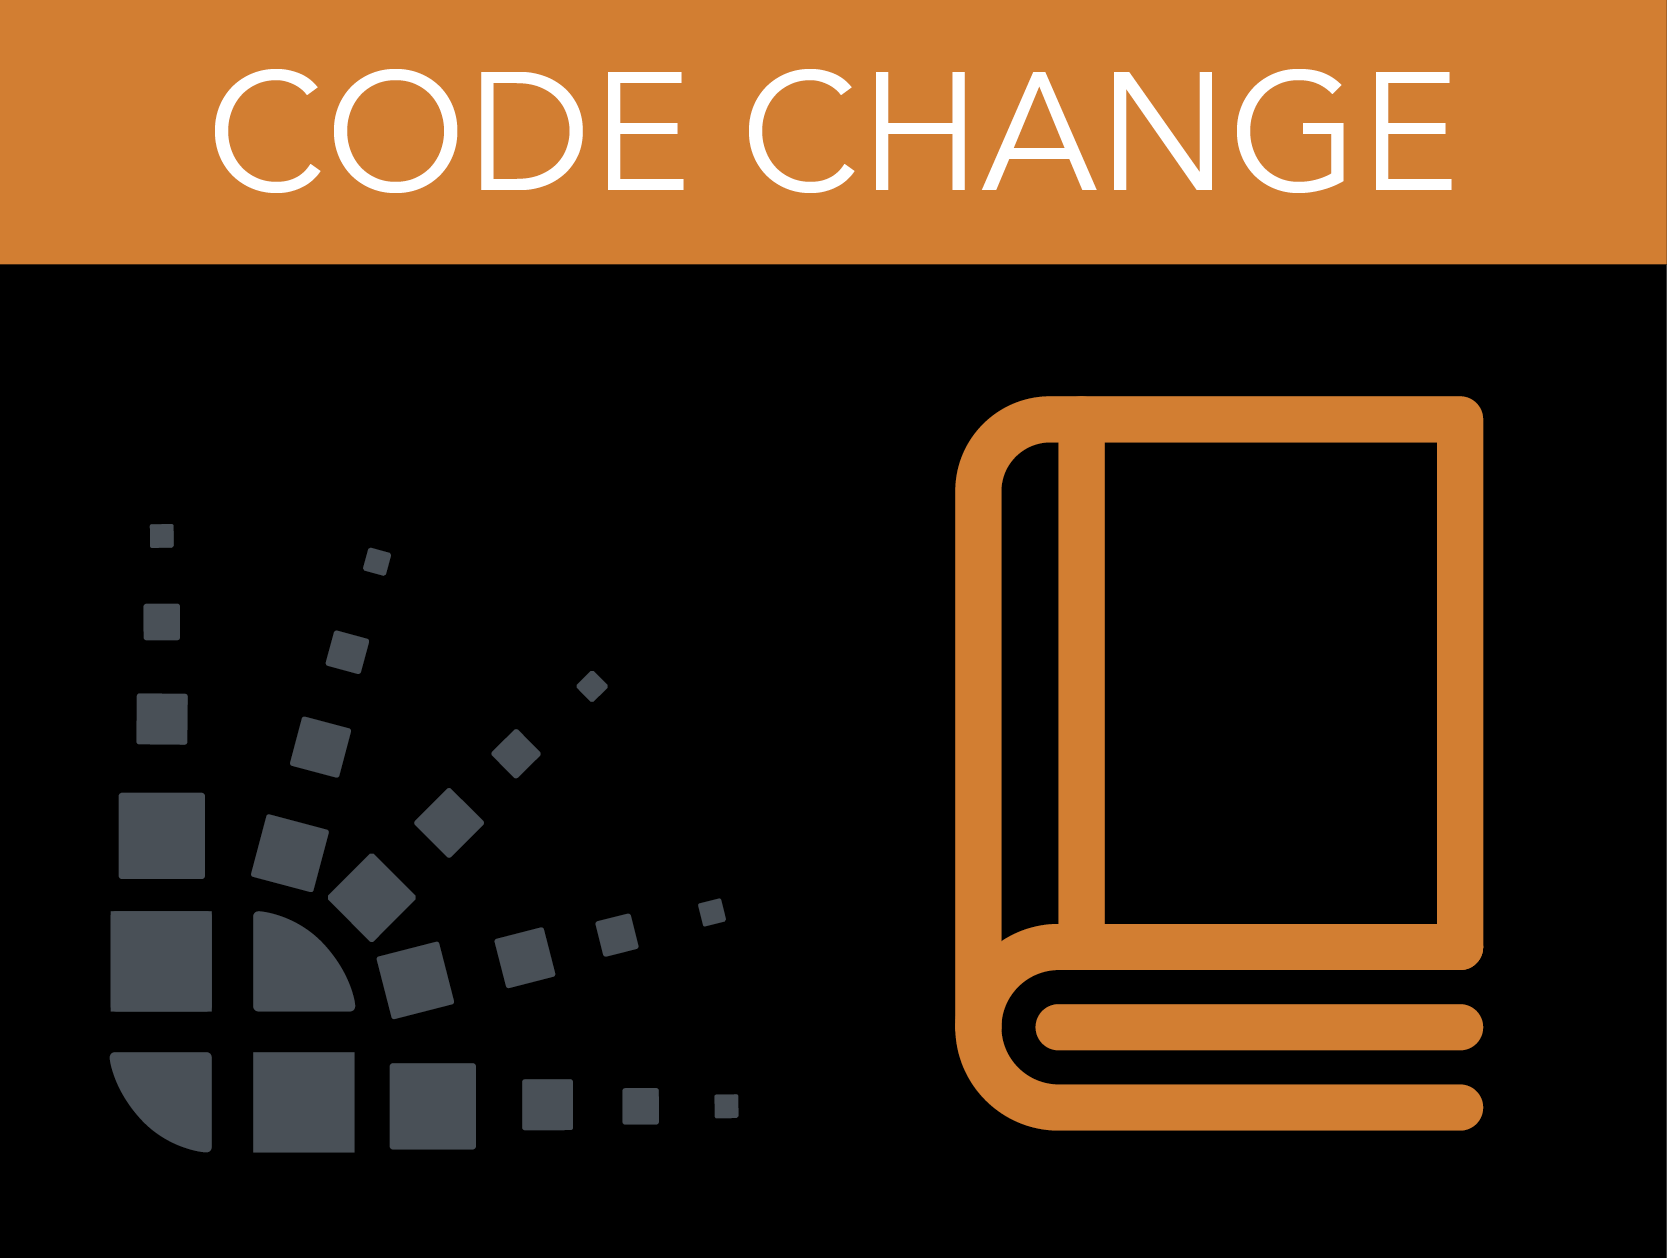 code_change_1